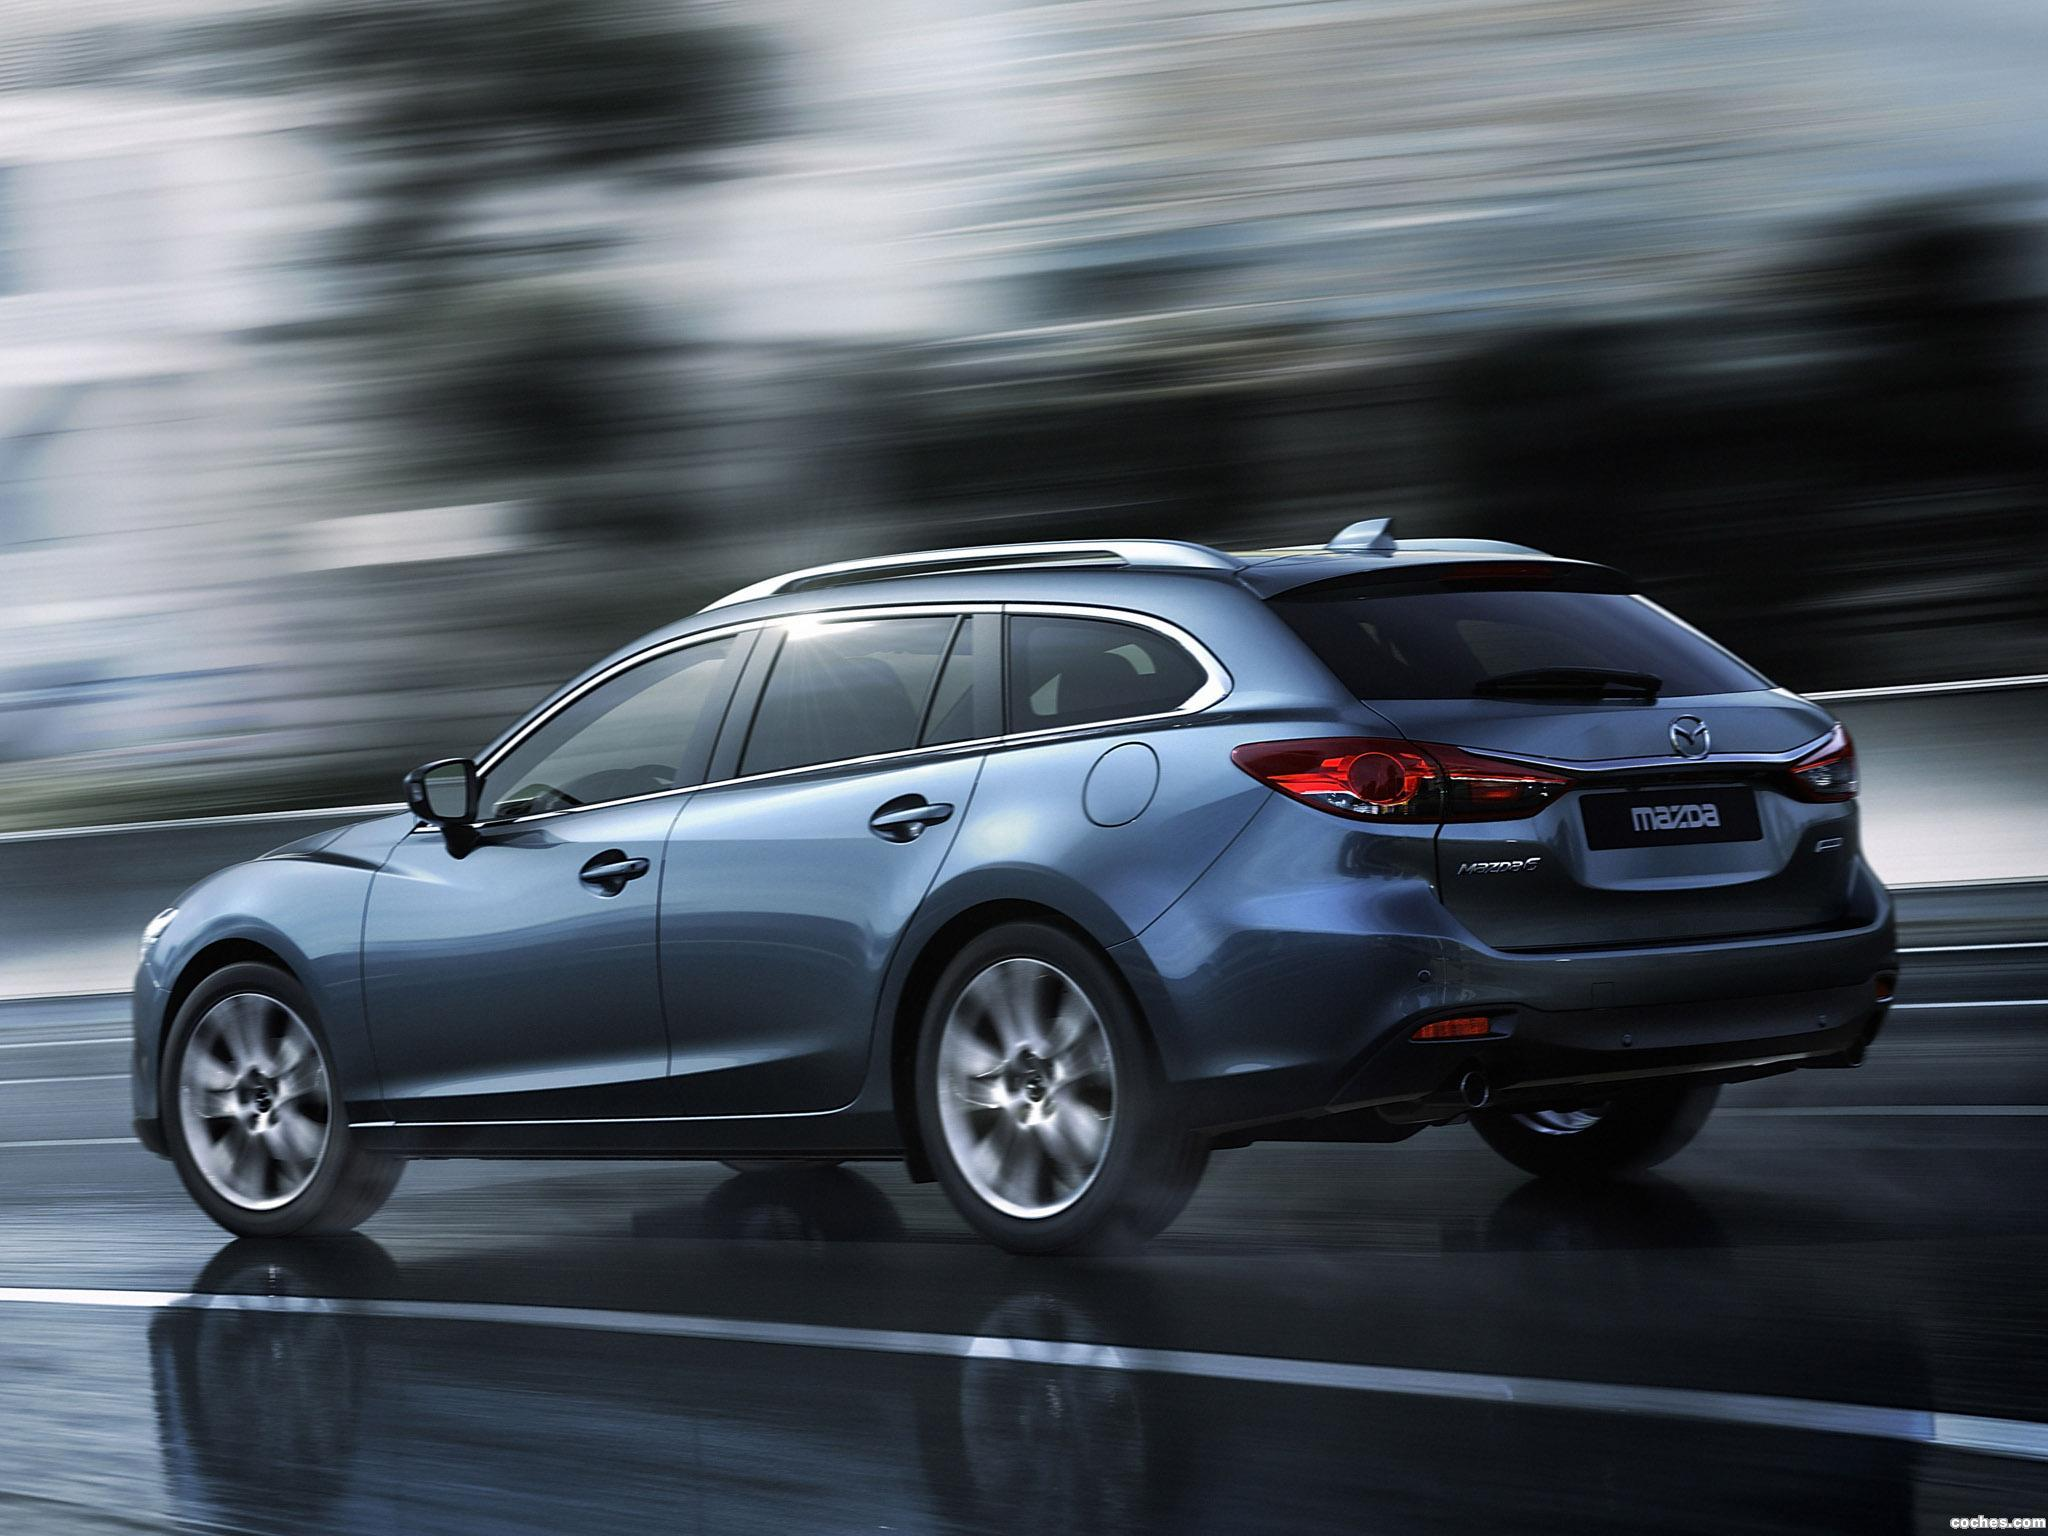 Foto 12 de Mazda 6 Wagon 2013